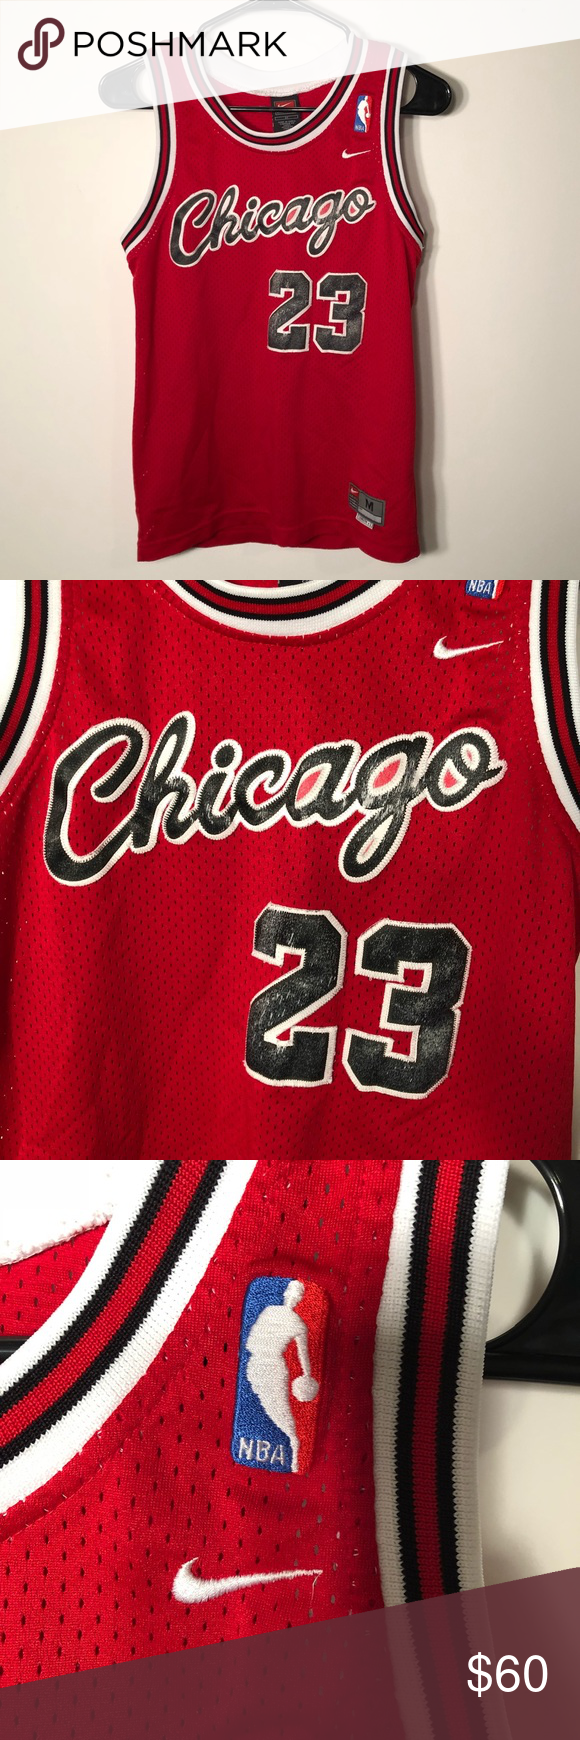 huge selection of b9abc 25d42 Nike Authentic Kids Medium Michael Jordan Jersey Nike ...